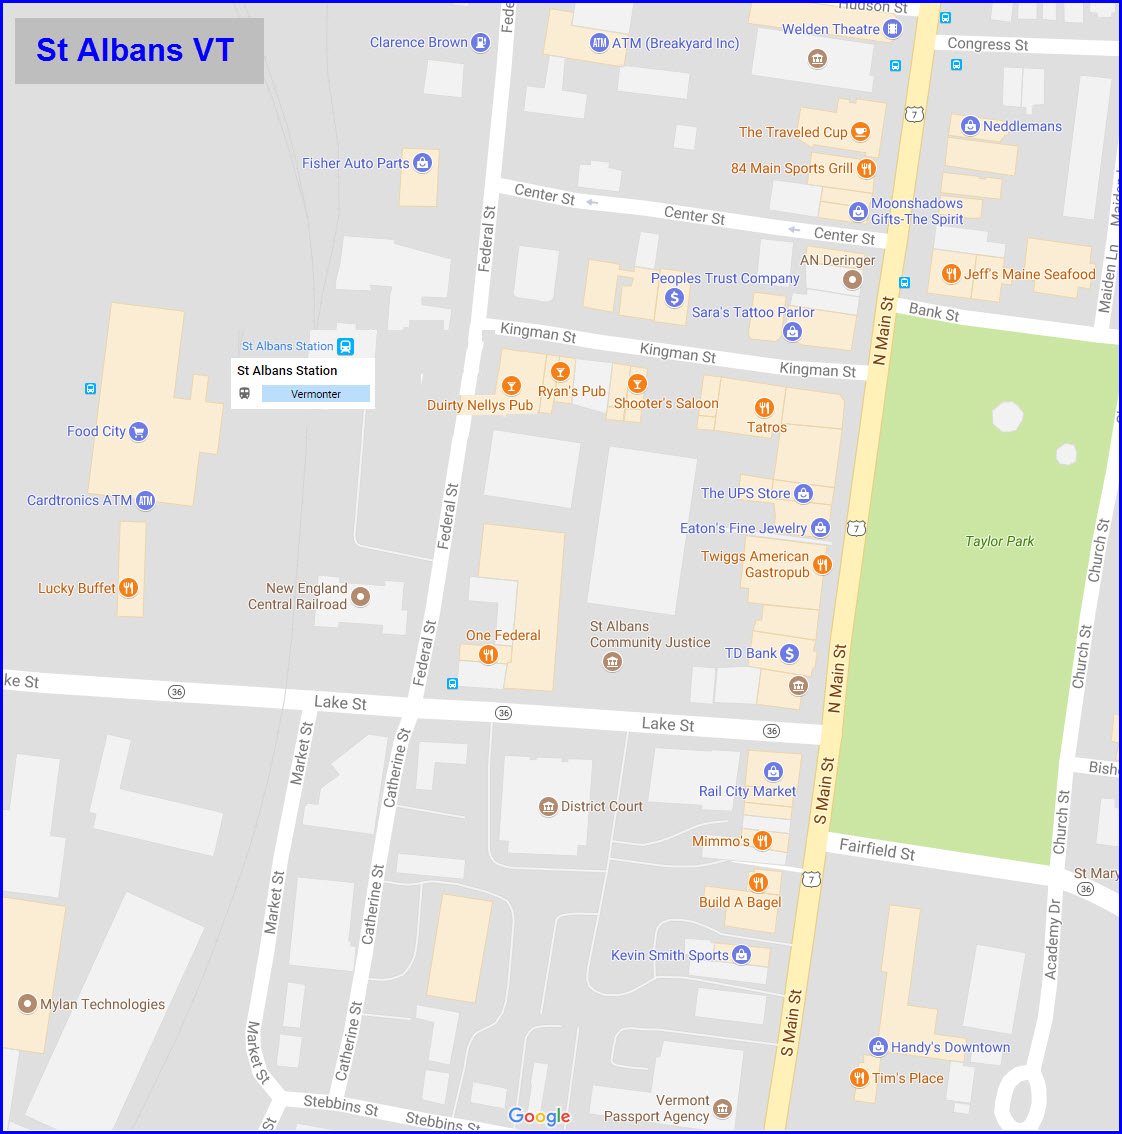 St Albans VT Railfan Guide